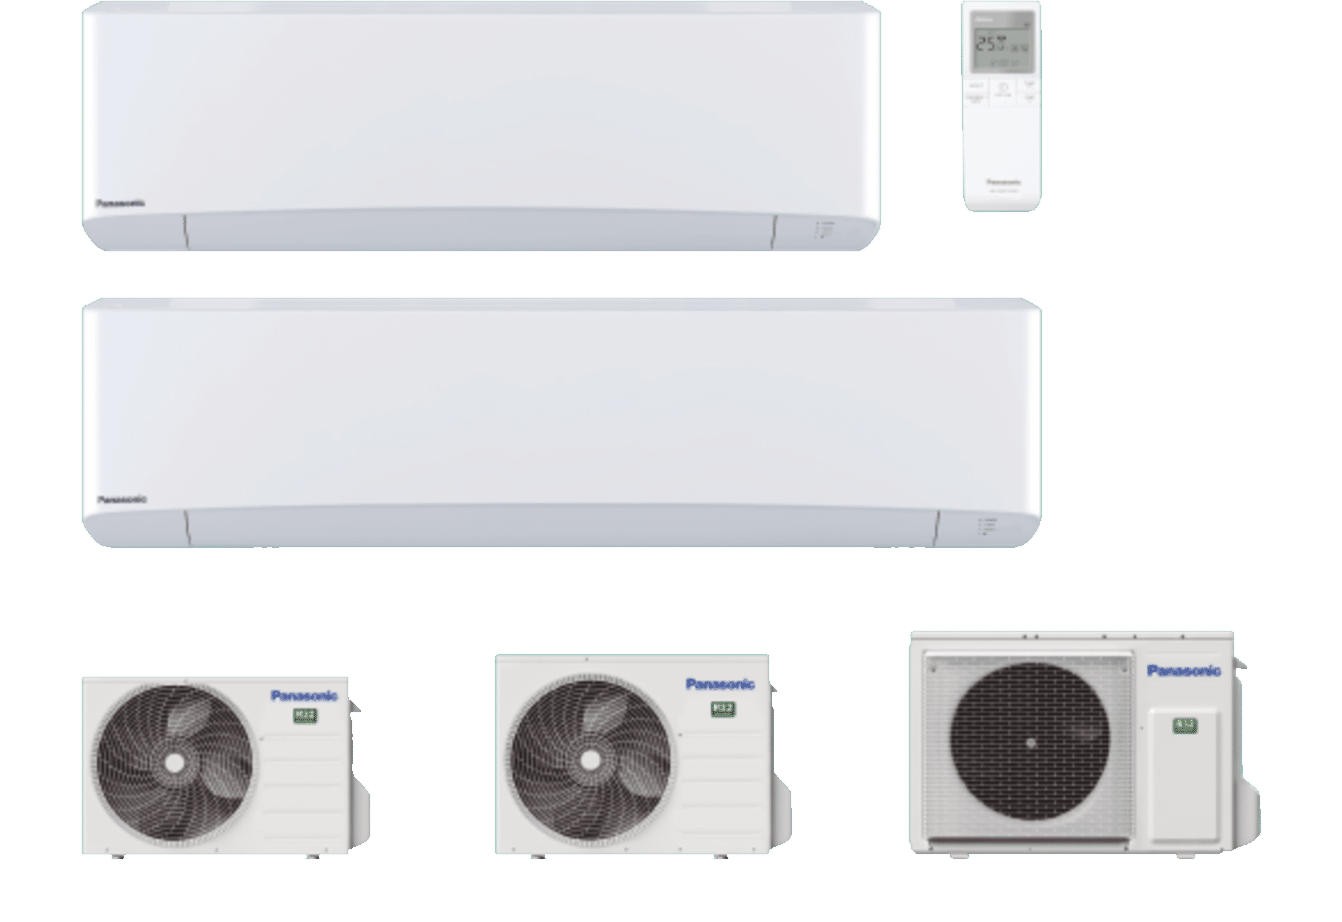 PANASONIC - Etherea Inverter+ blanc pur mat • R32